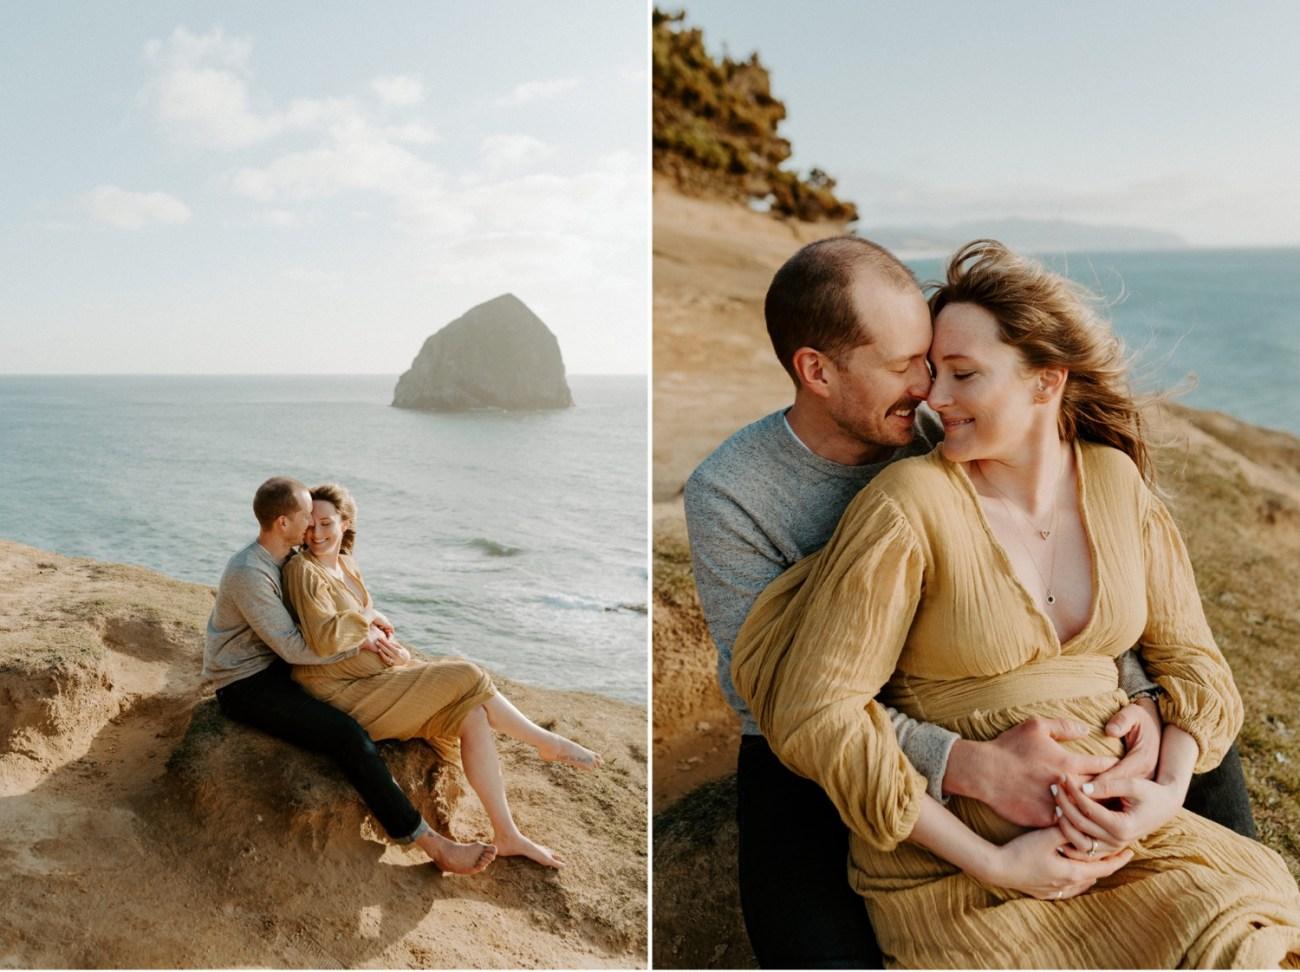 Pacific City Oregon Maternity Session Cape Kiwanda Couple Session Bend Wedding Photogtapher Anais Possamai Photography 004